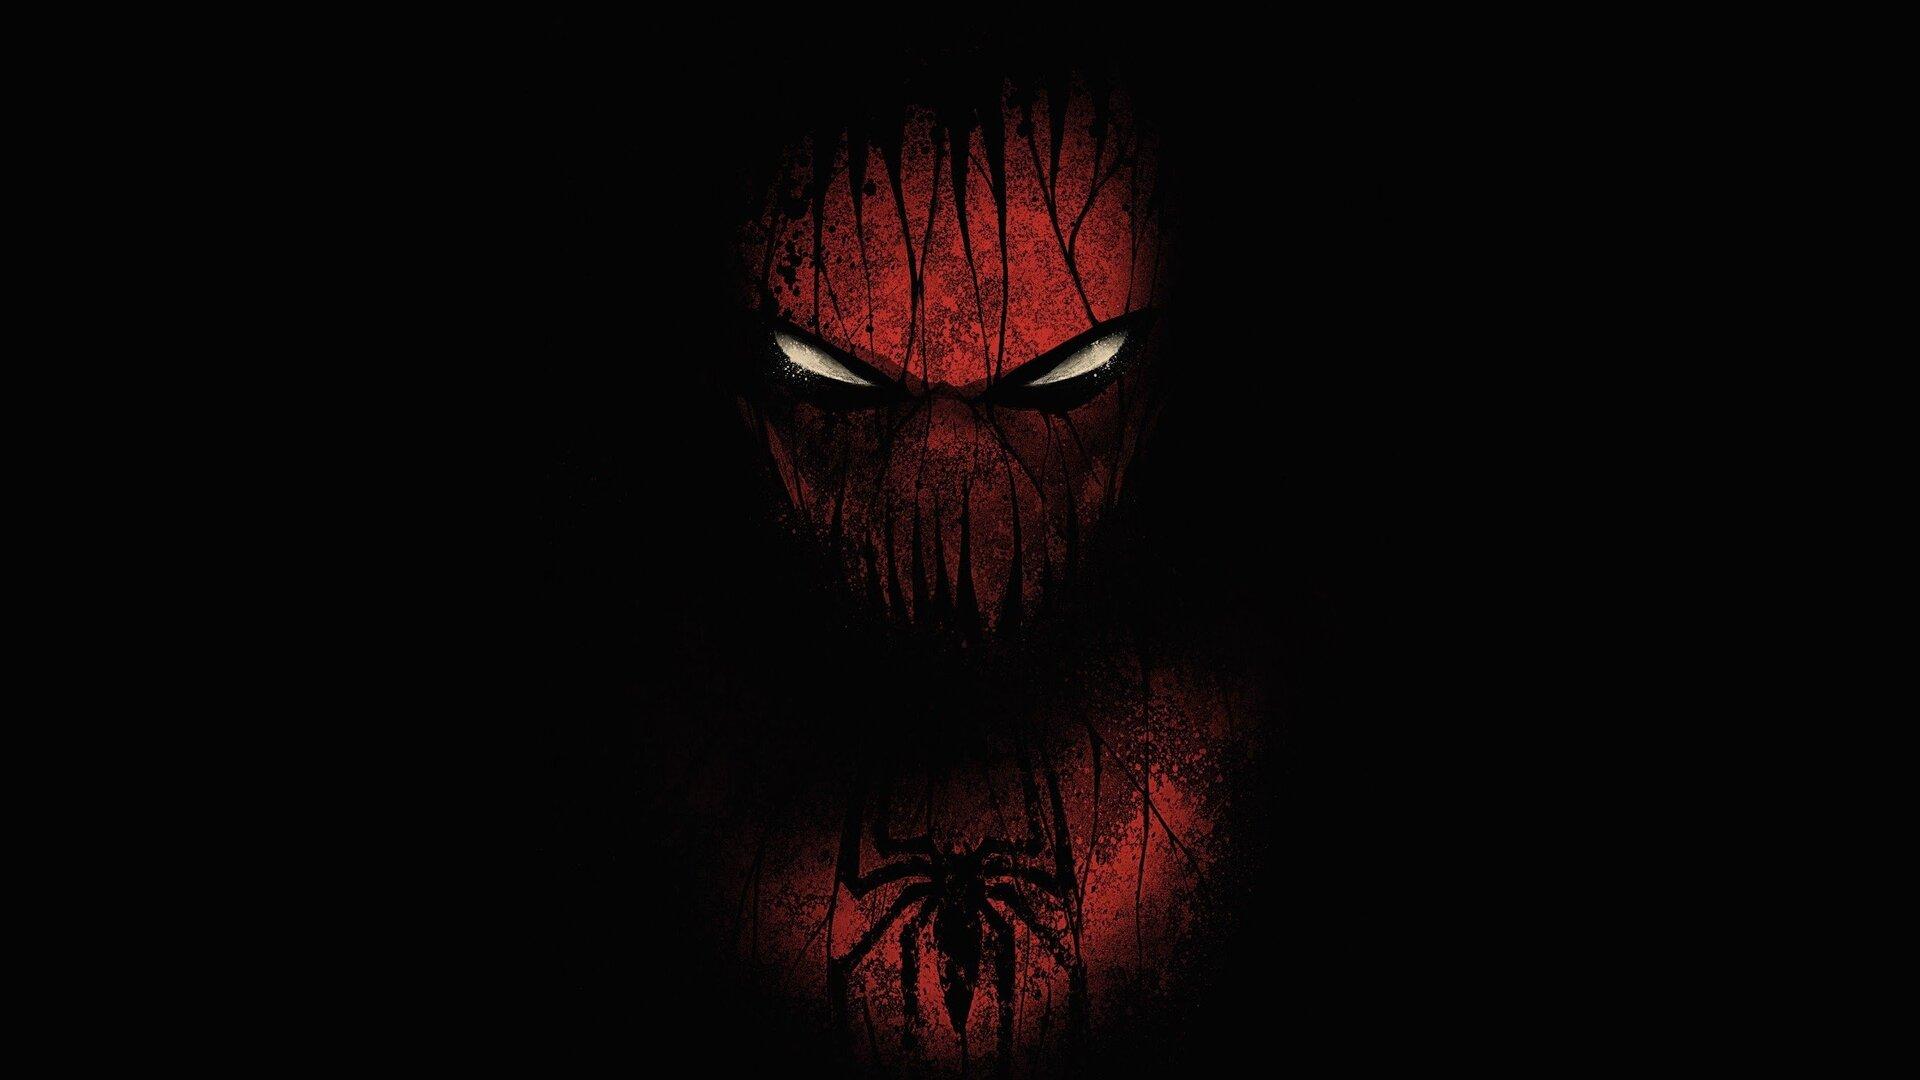 1920x1080 Red Black Spiderman Laptop Full Hd 1080p Hd 4k Wallpapers